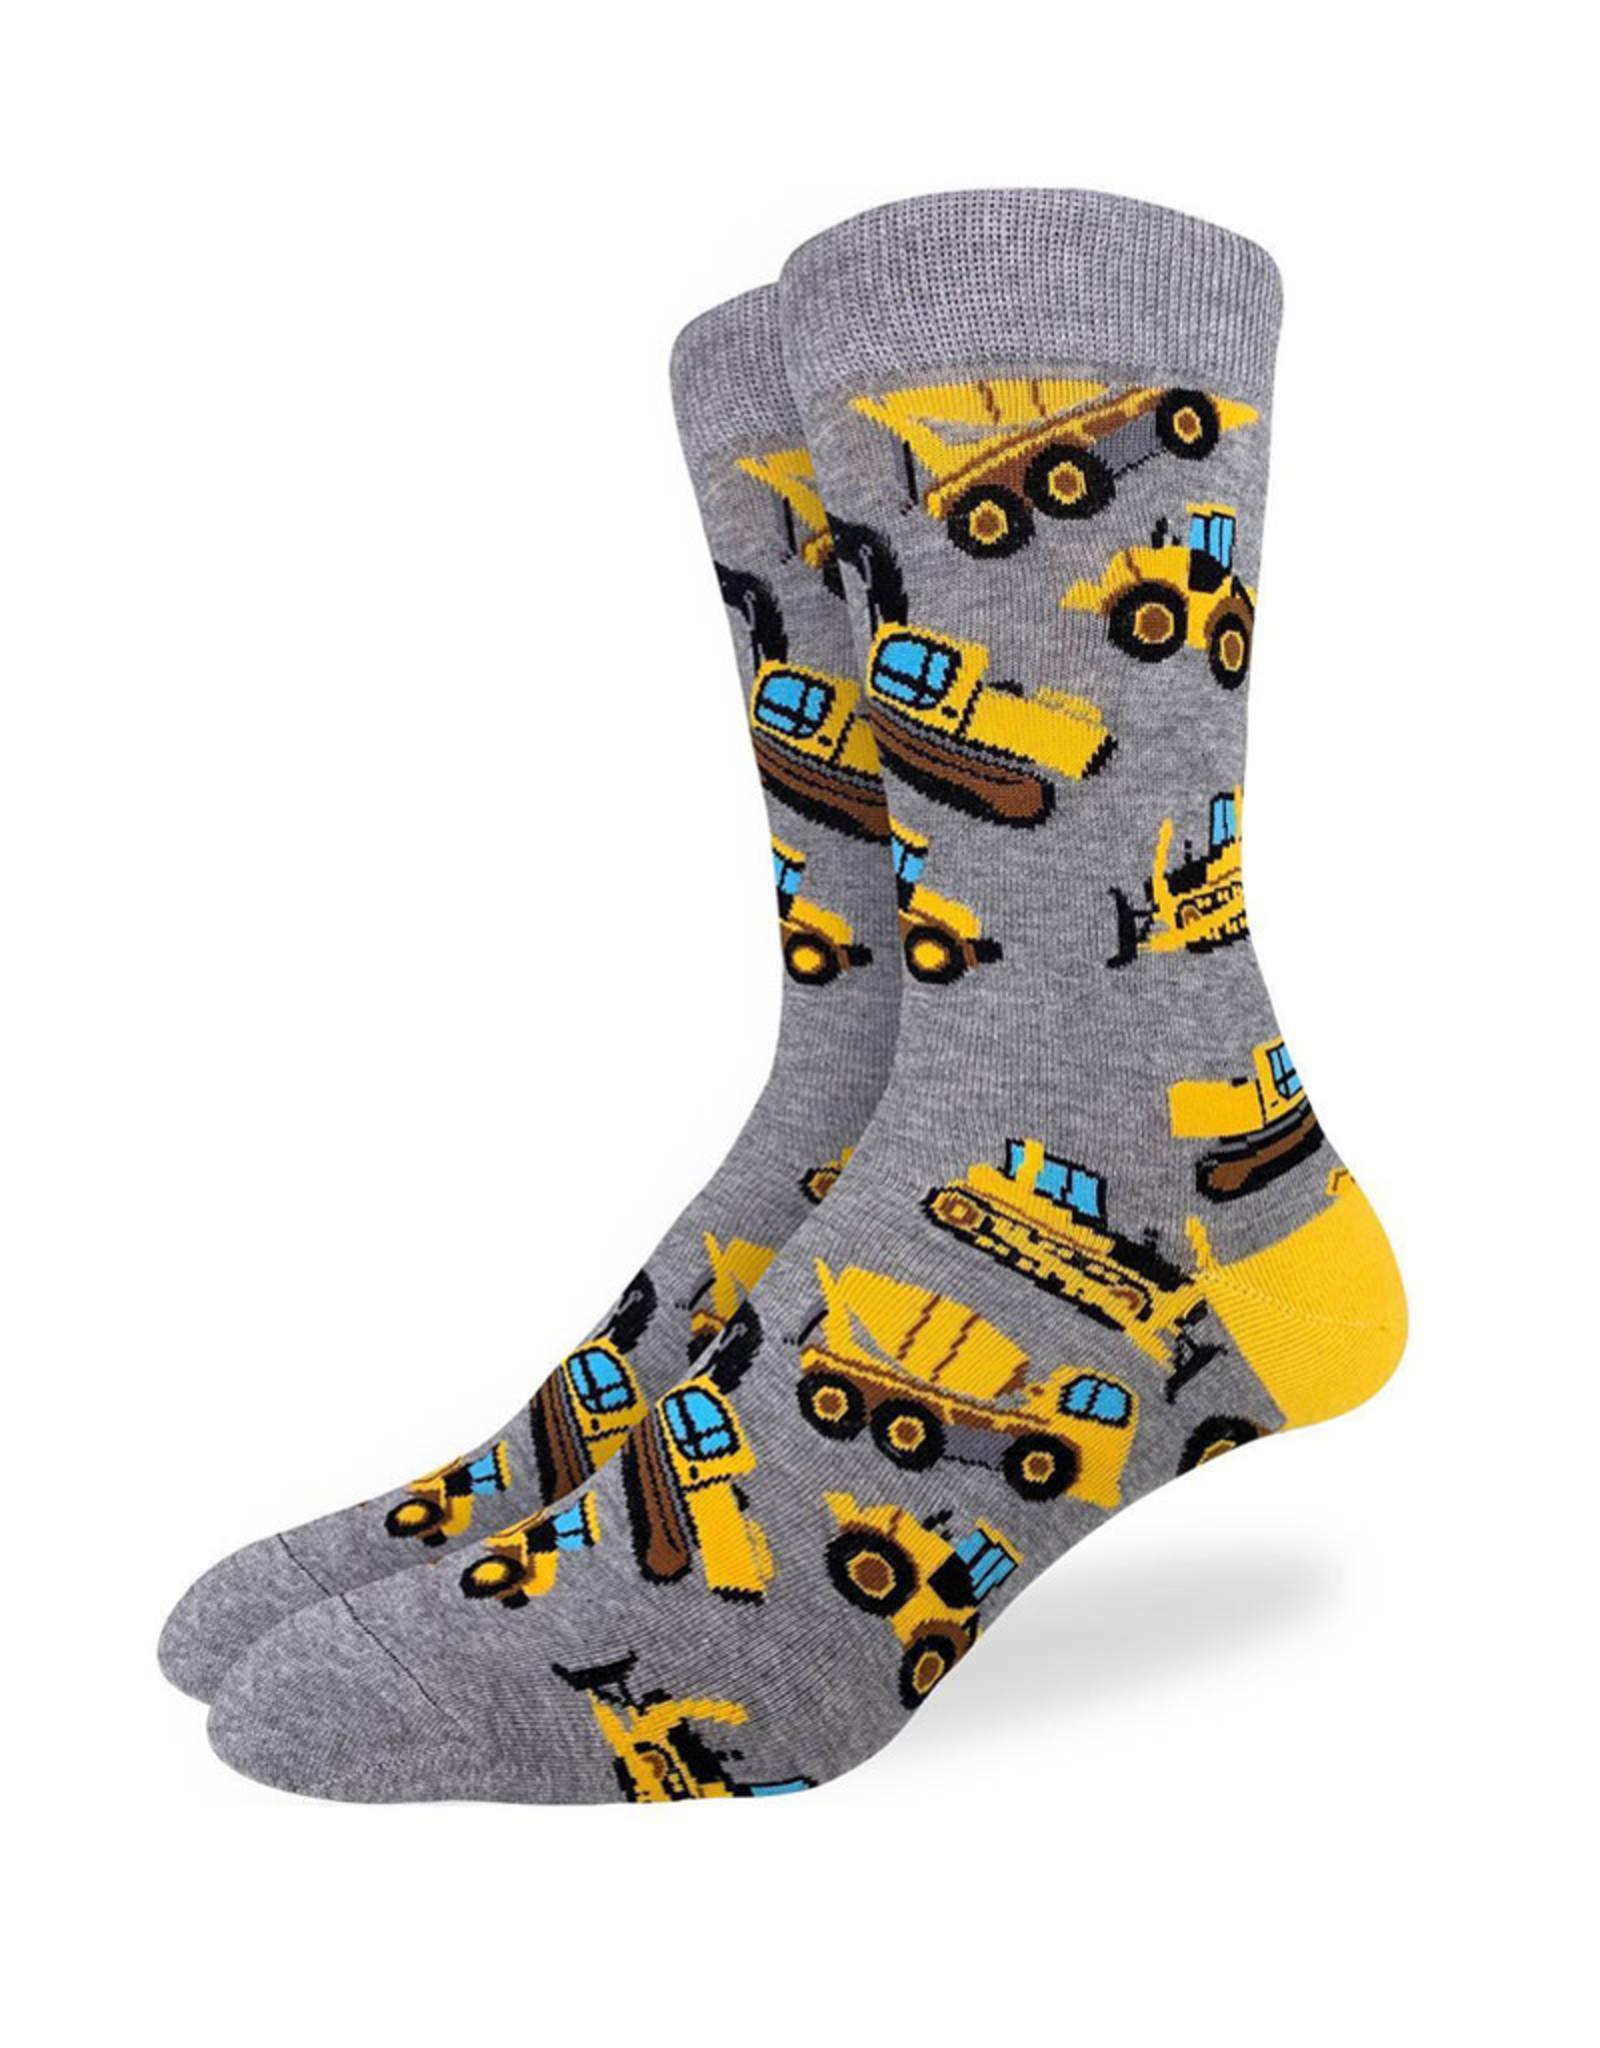 Construction ( Good Luck Sock Socks )